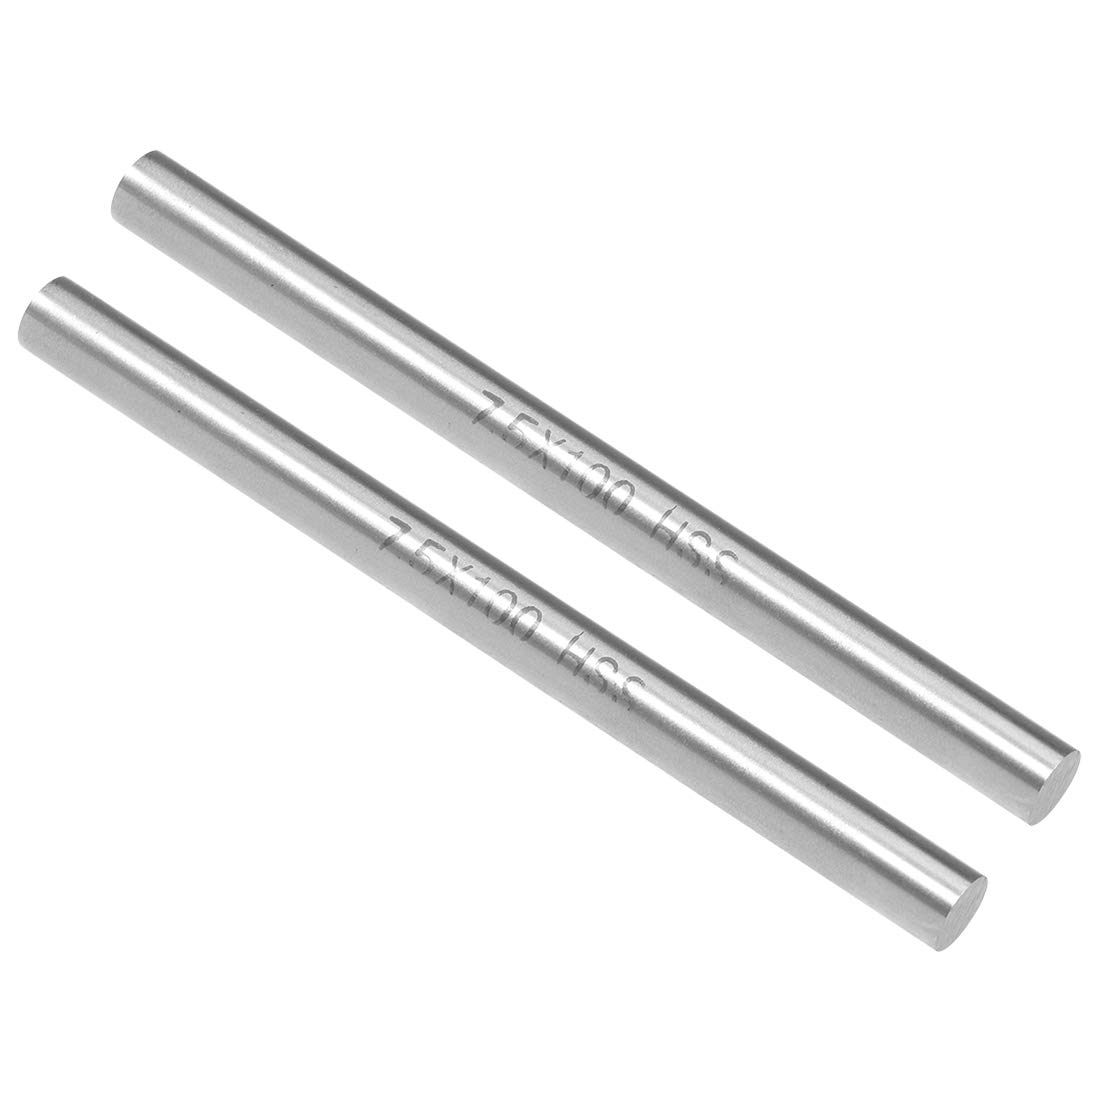 sourcing map HSS Lathe Round Rod Solid Shaft Bar 12mm Dia 100mm Length 2Pcs